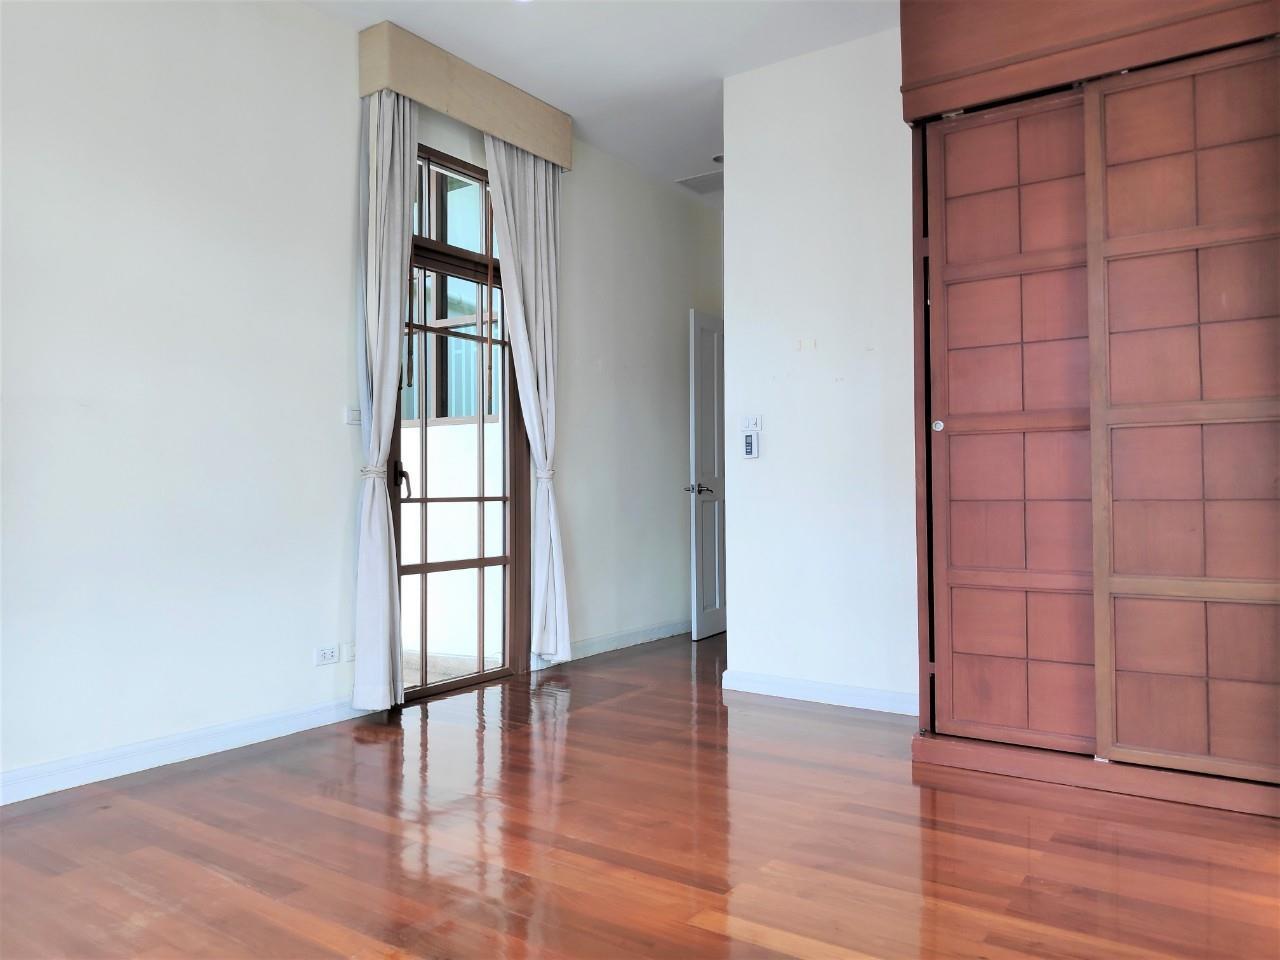 Agent - Natchga Boonkrong  Agency's For Rent House 4 Bedrooms Baan Sansiri Sukhumvit 67 13